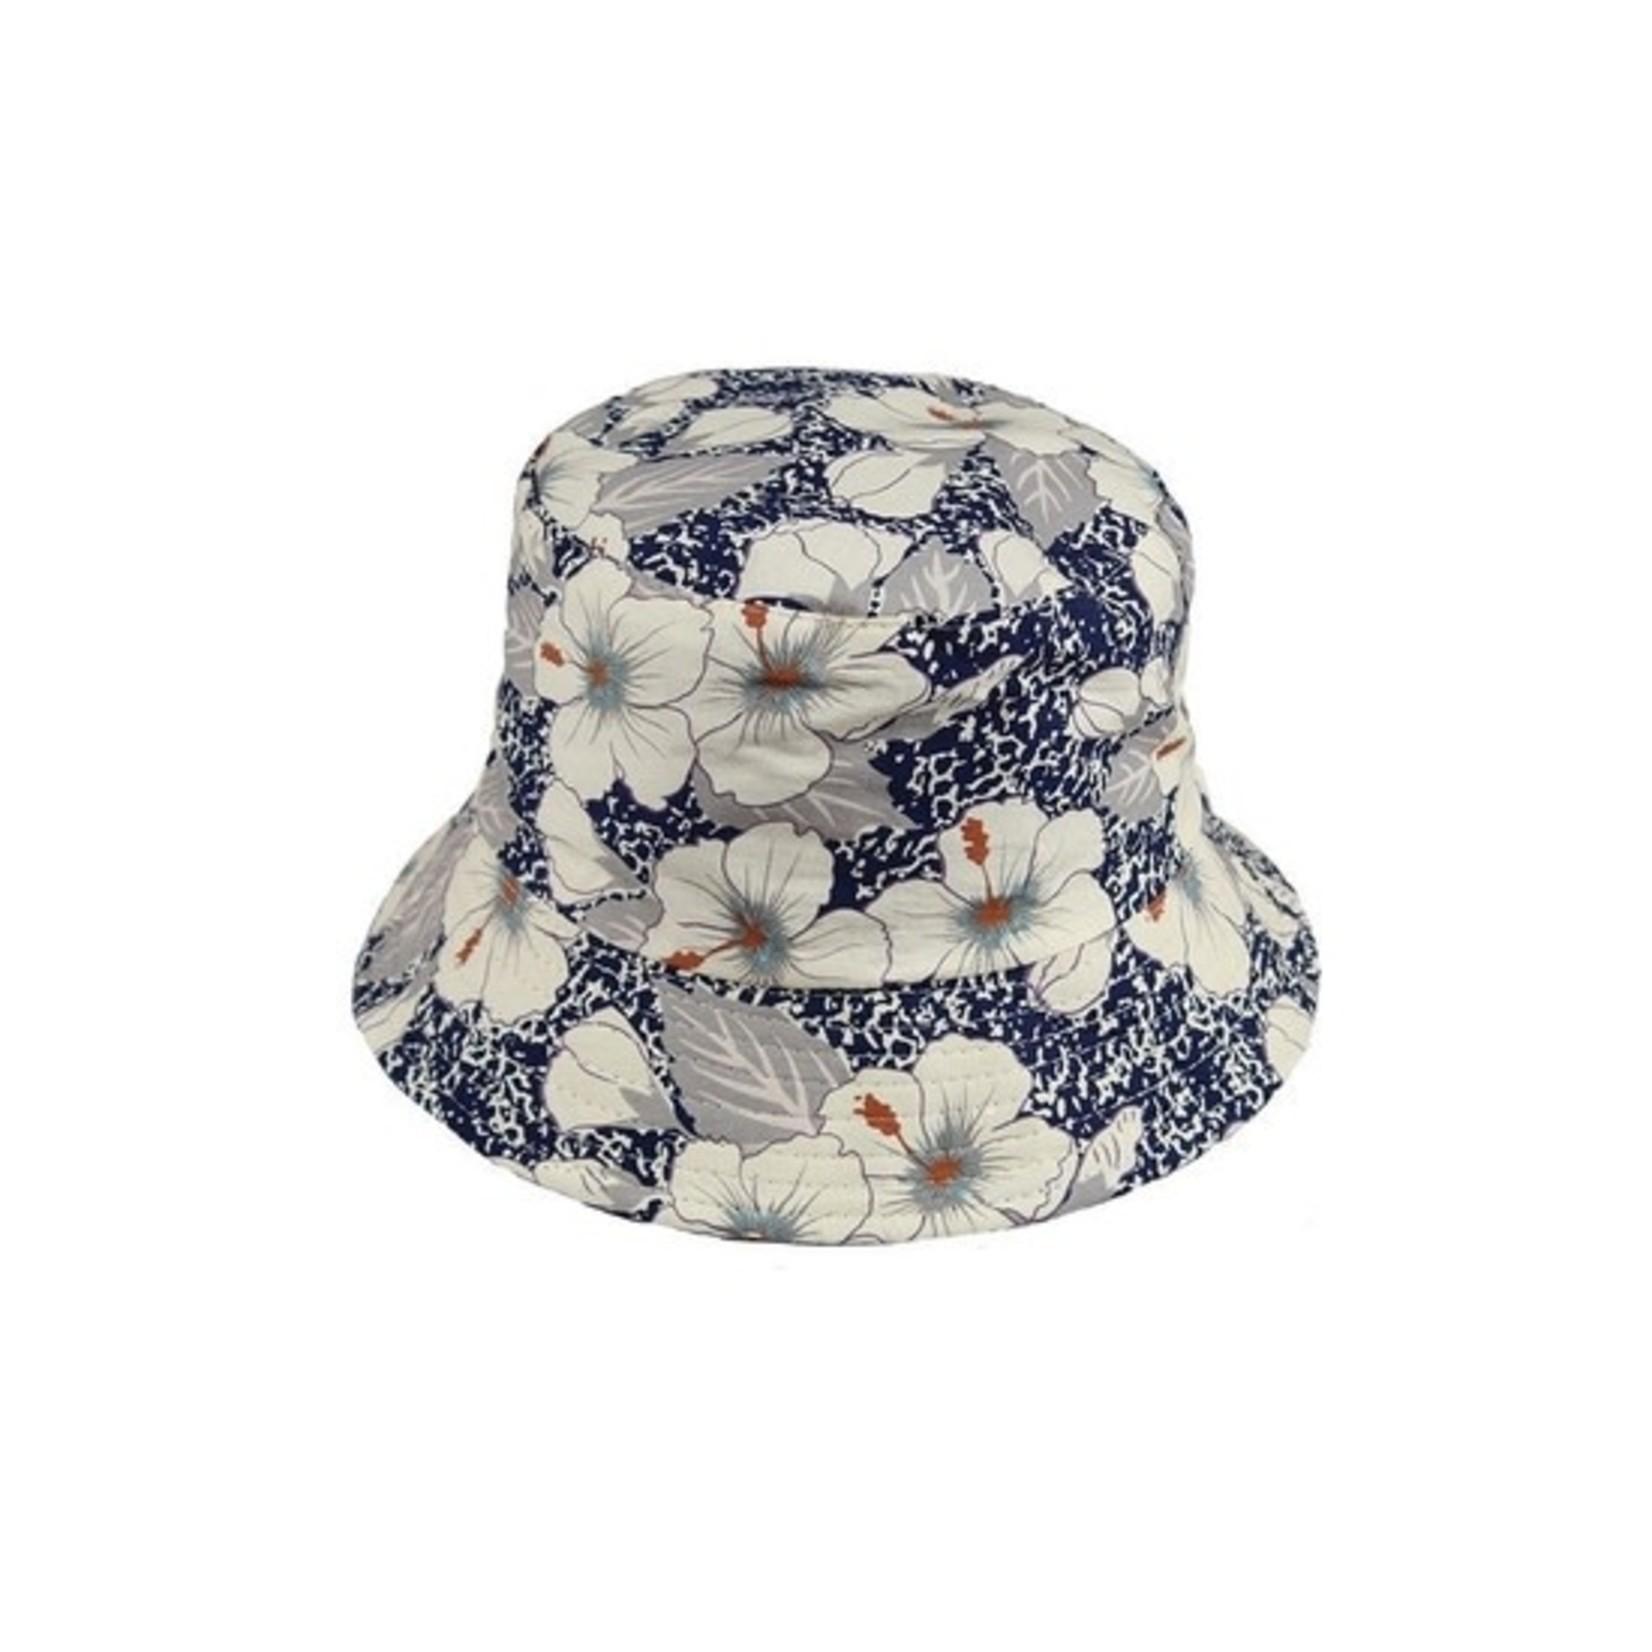 Floral Bucket Hat in Blue